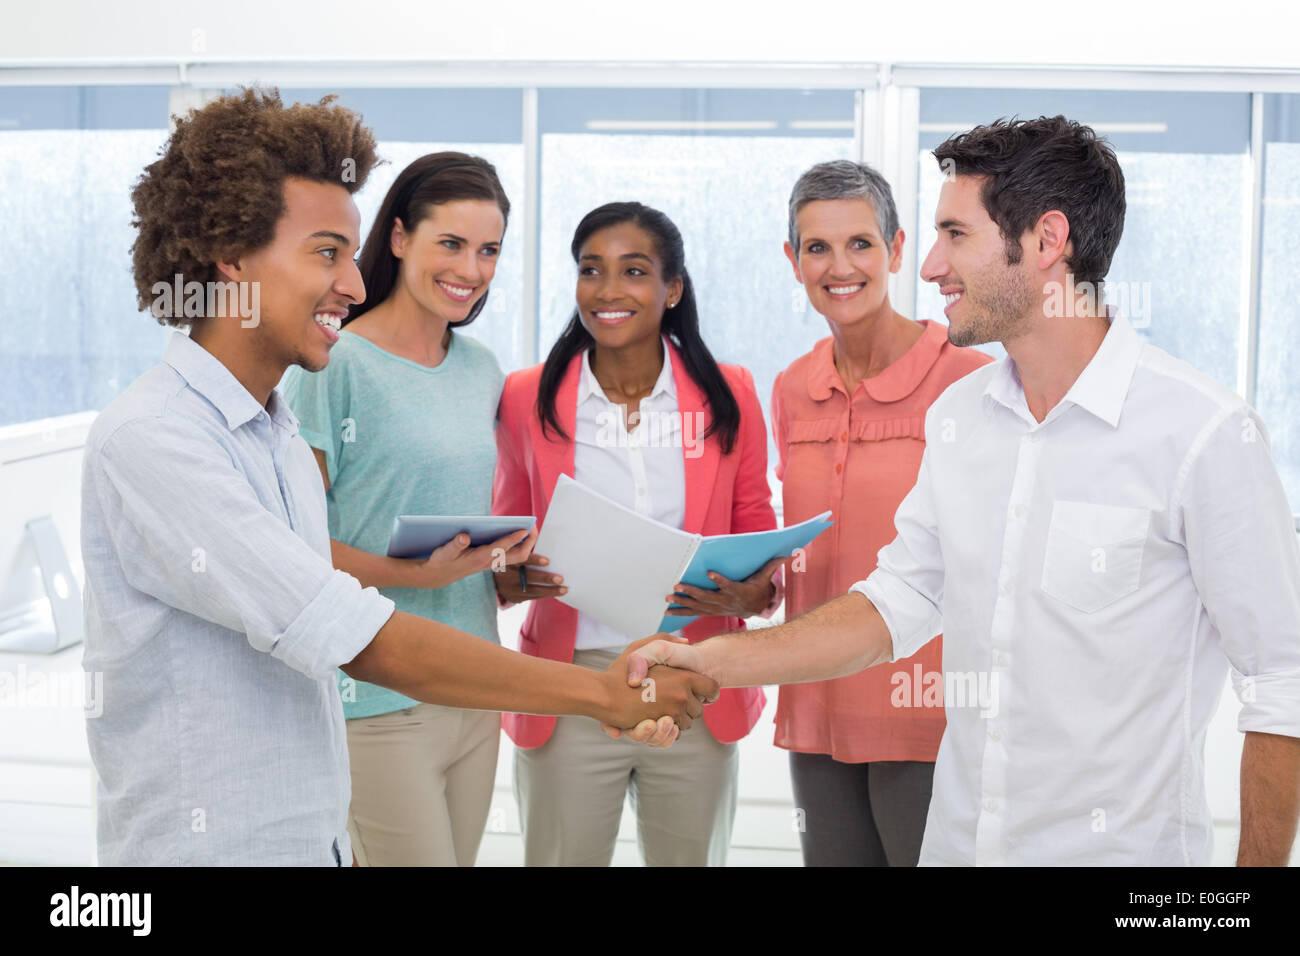 Attractive businessmen shaking hands at work - Stock Image